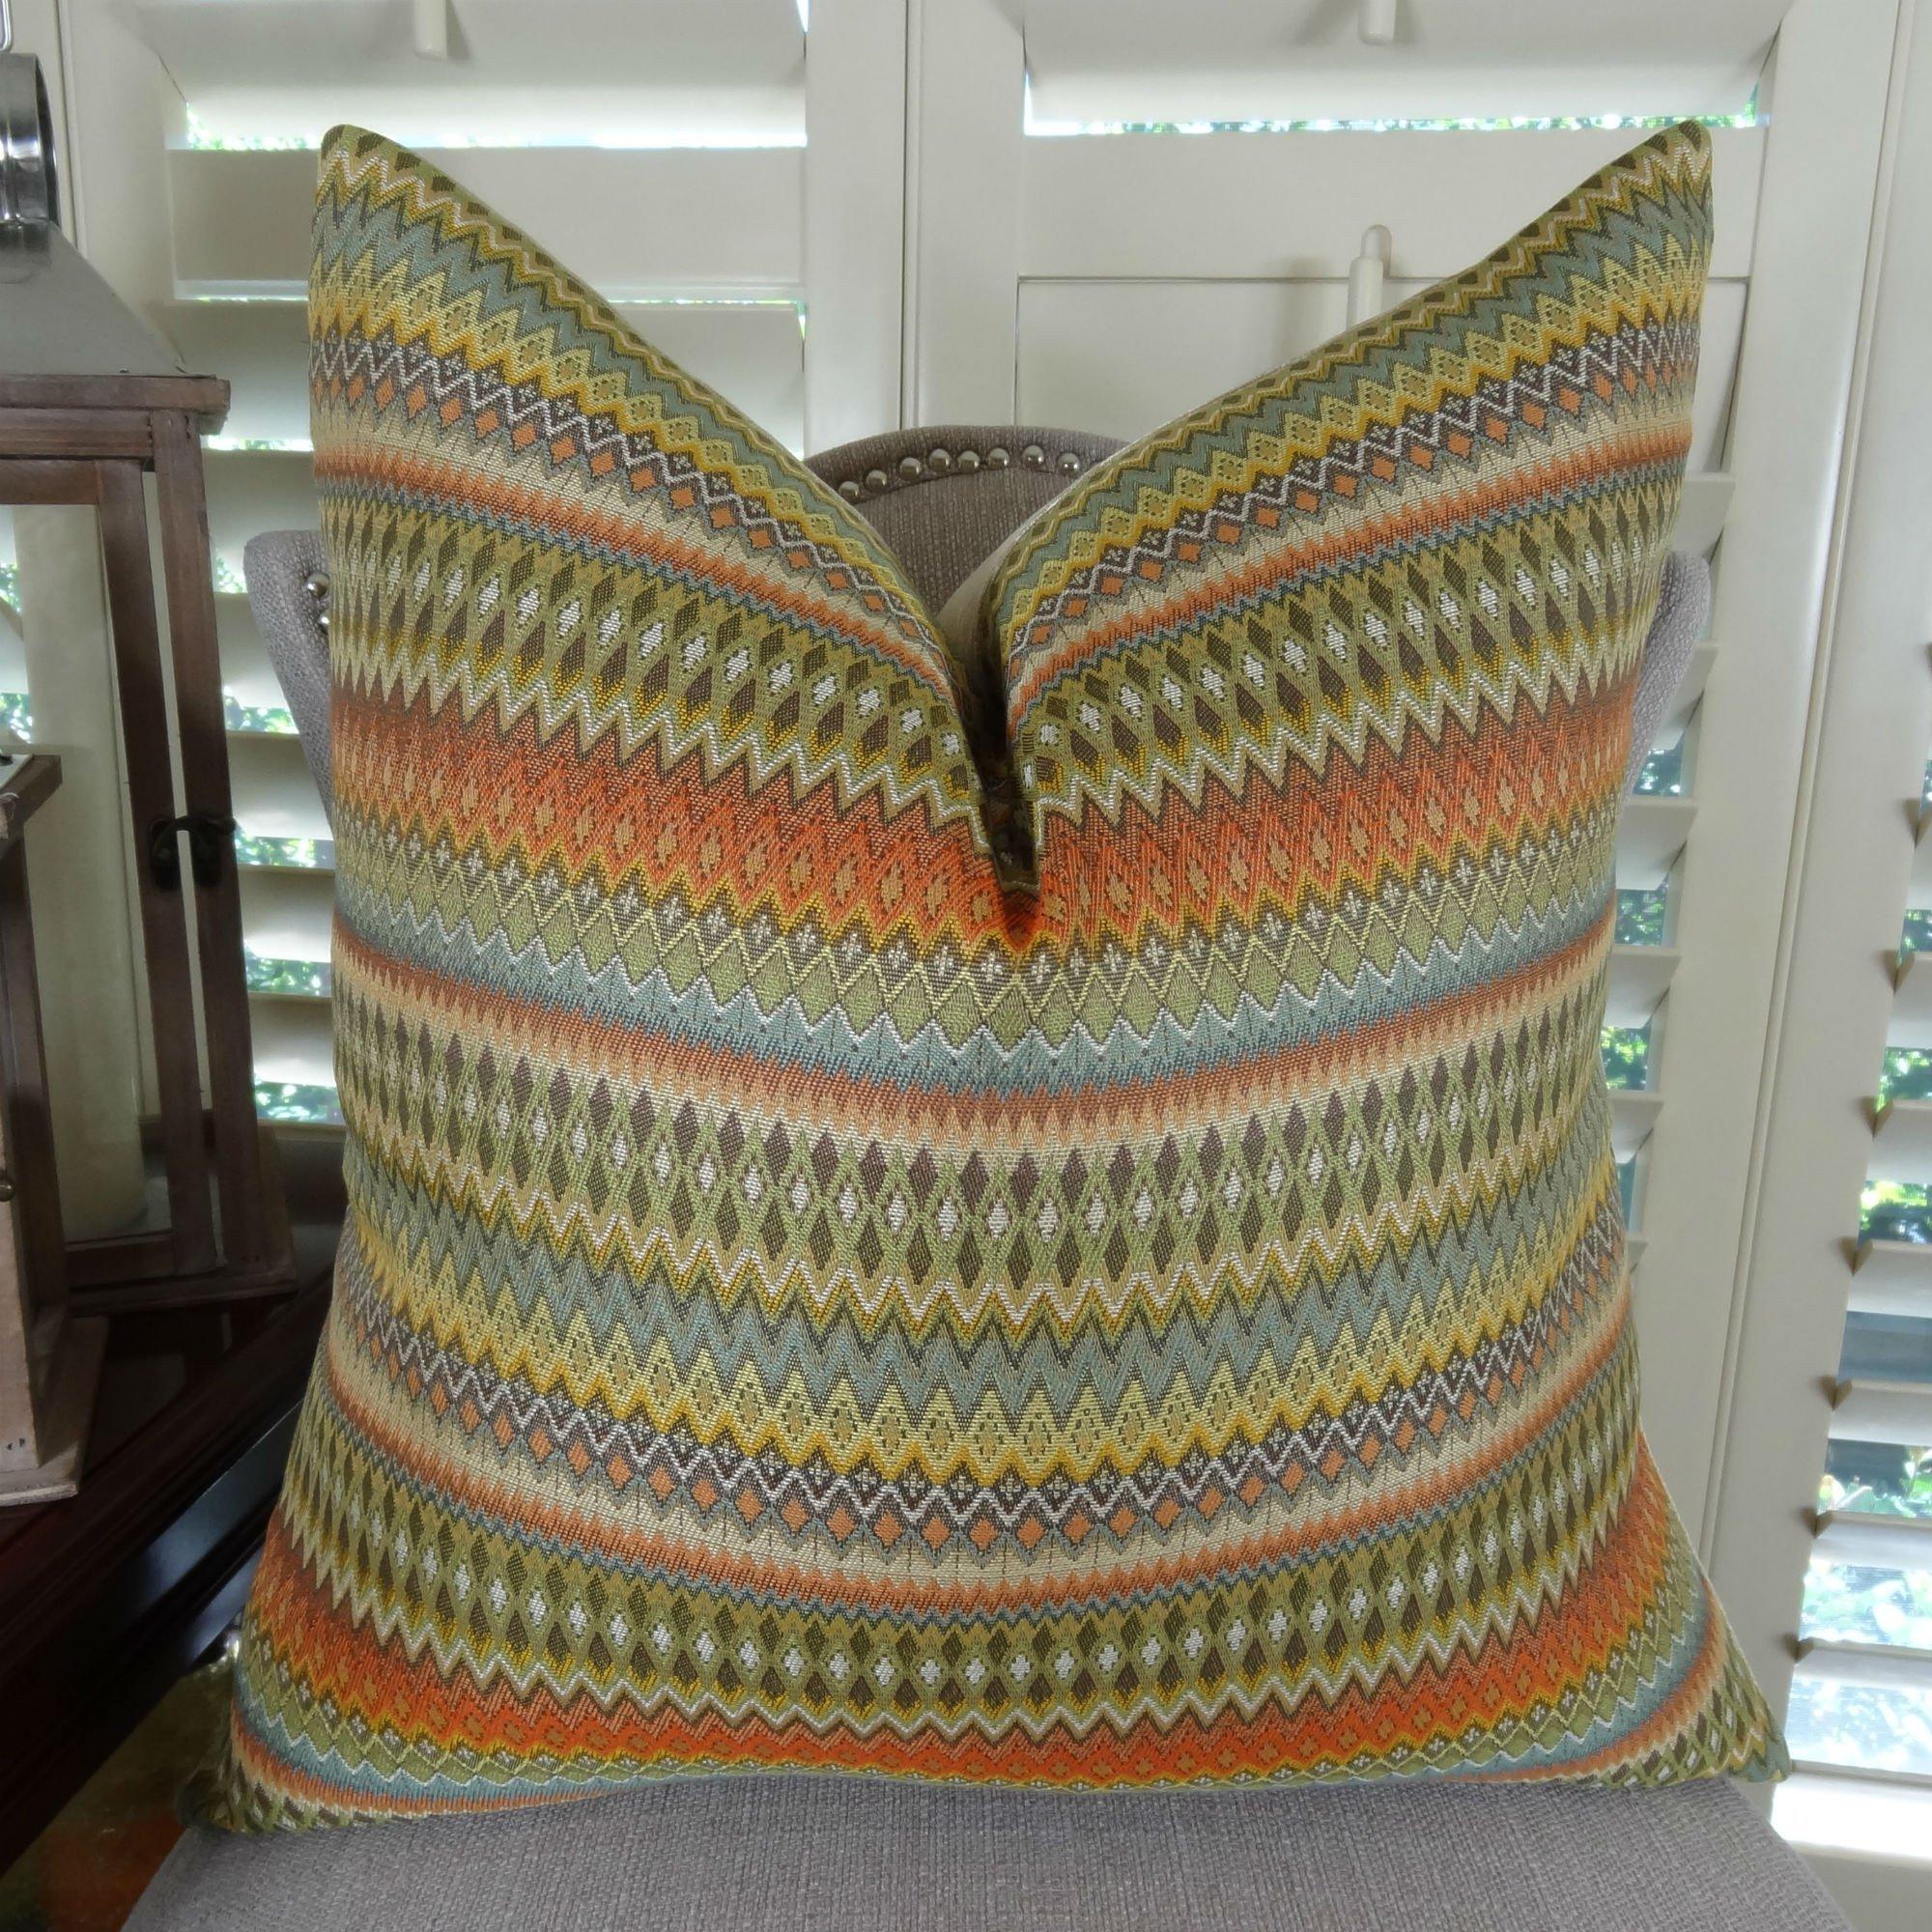 Thomas Collection Decorative Stripe Throw Pillow, Light Green Brown Yellow Orange Gray Cream Tan Stripe Pillow, Zig Zag Chevron Designer Pillow, COVER ONLY, NO INSERT, Made in America, 11042